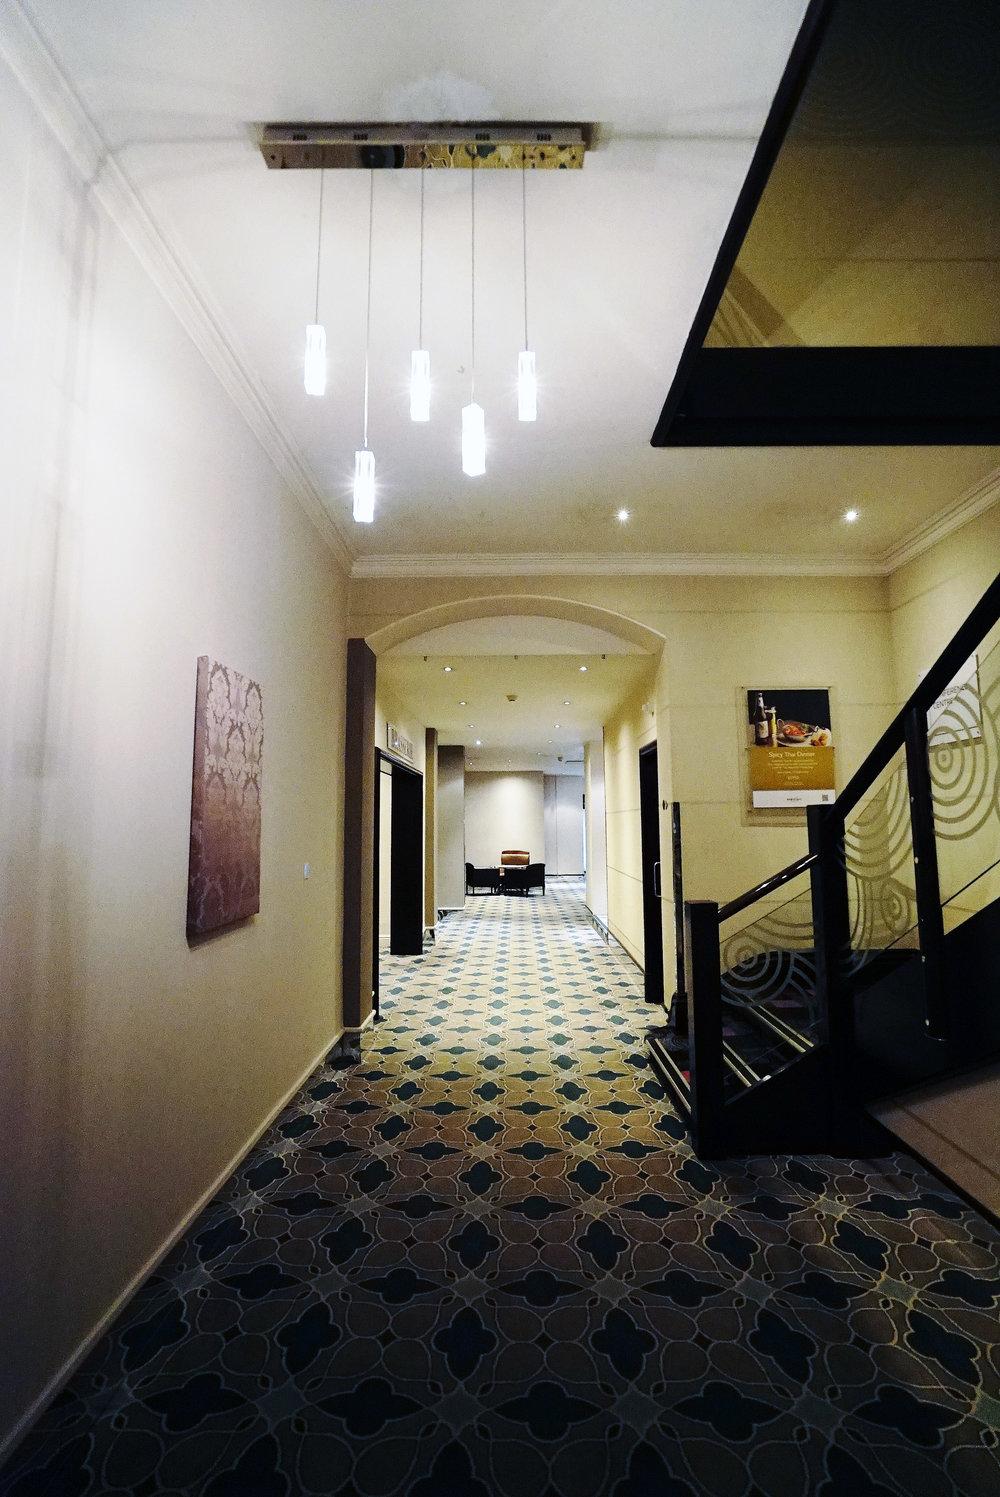 Mercure Chester Hallway.jpg